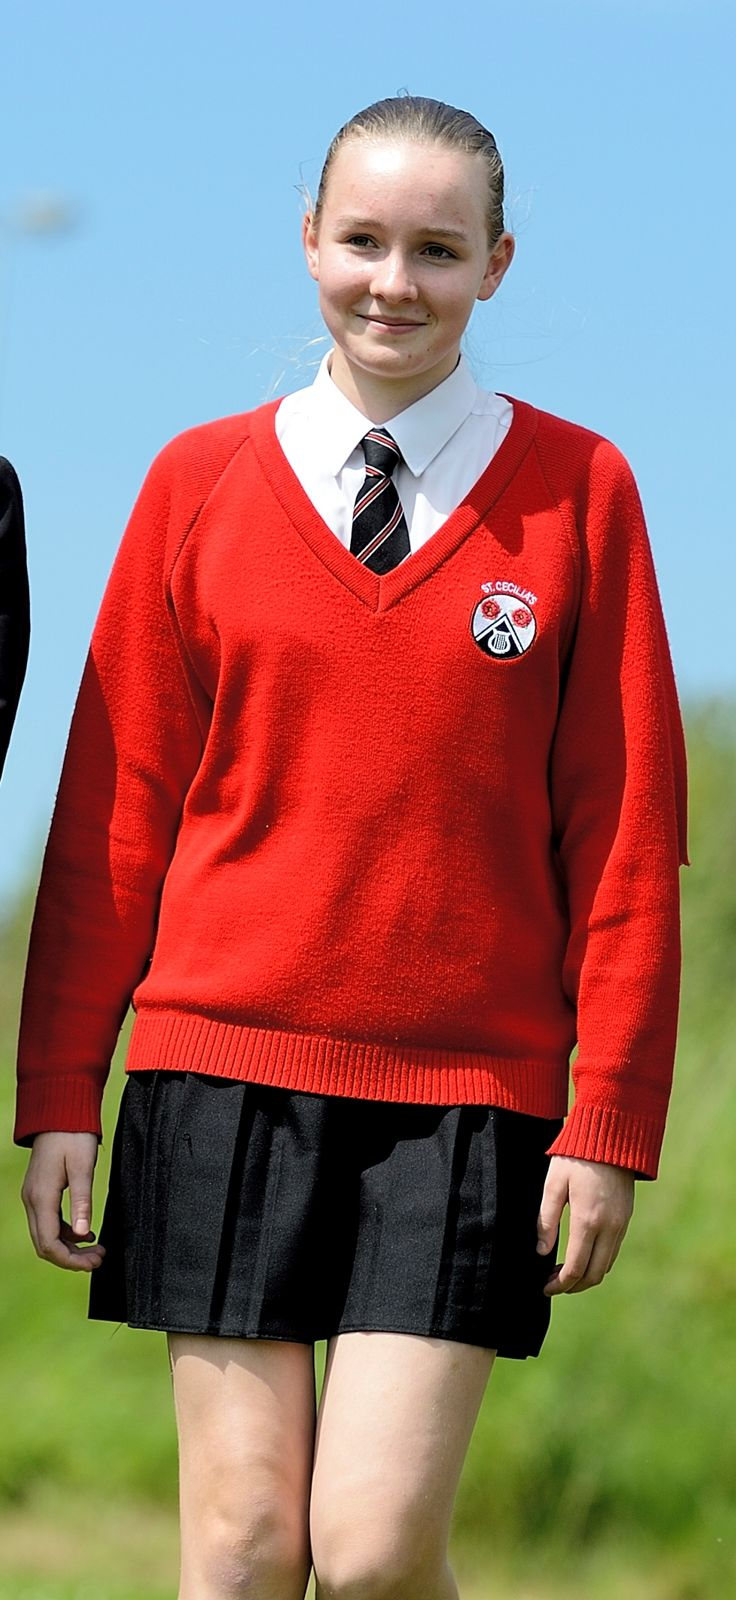 High school uniforms essay